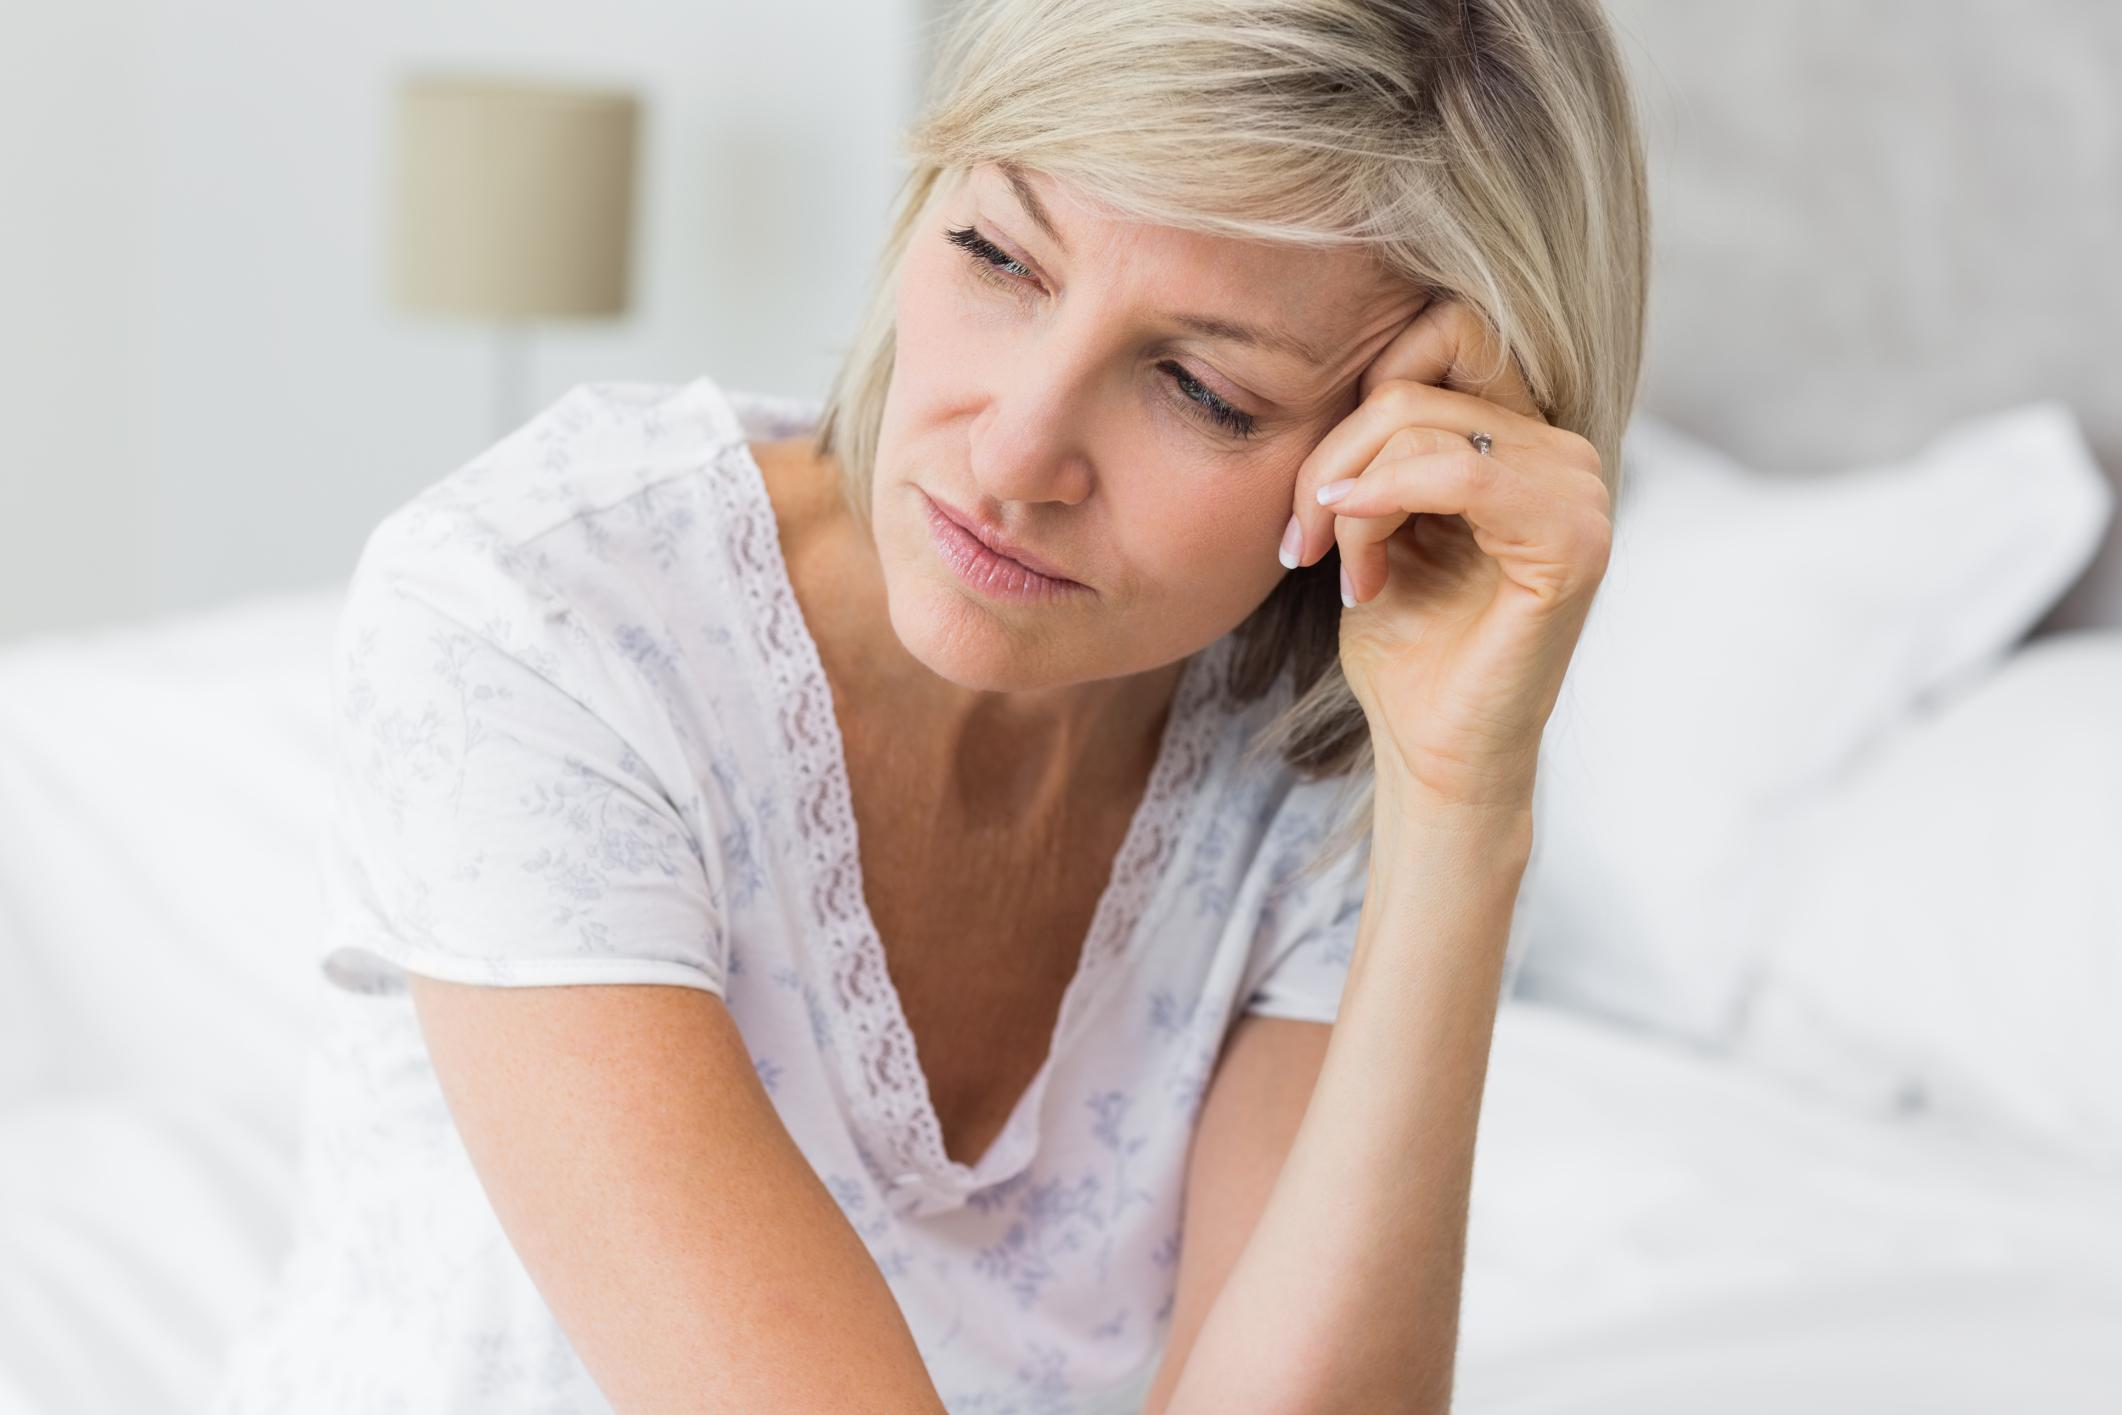 Womens orgasm after menopause